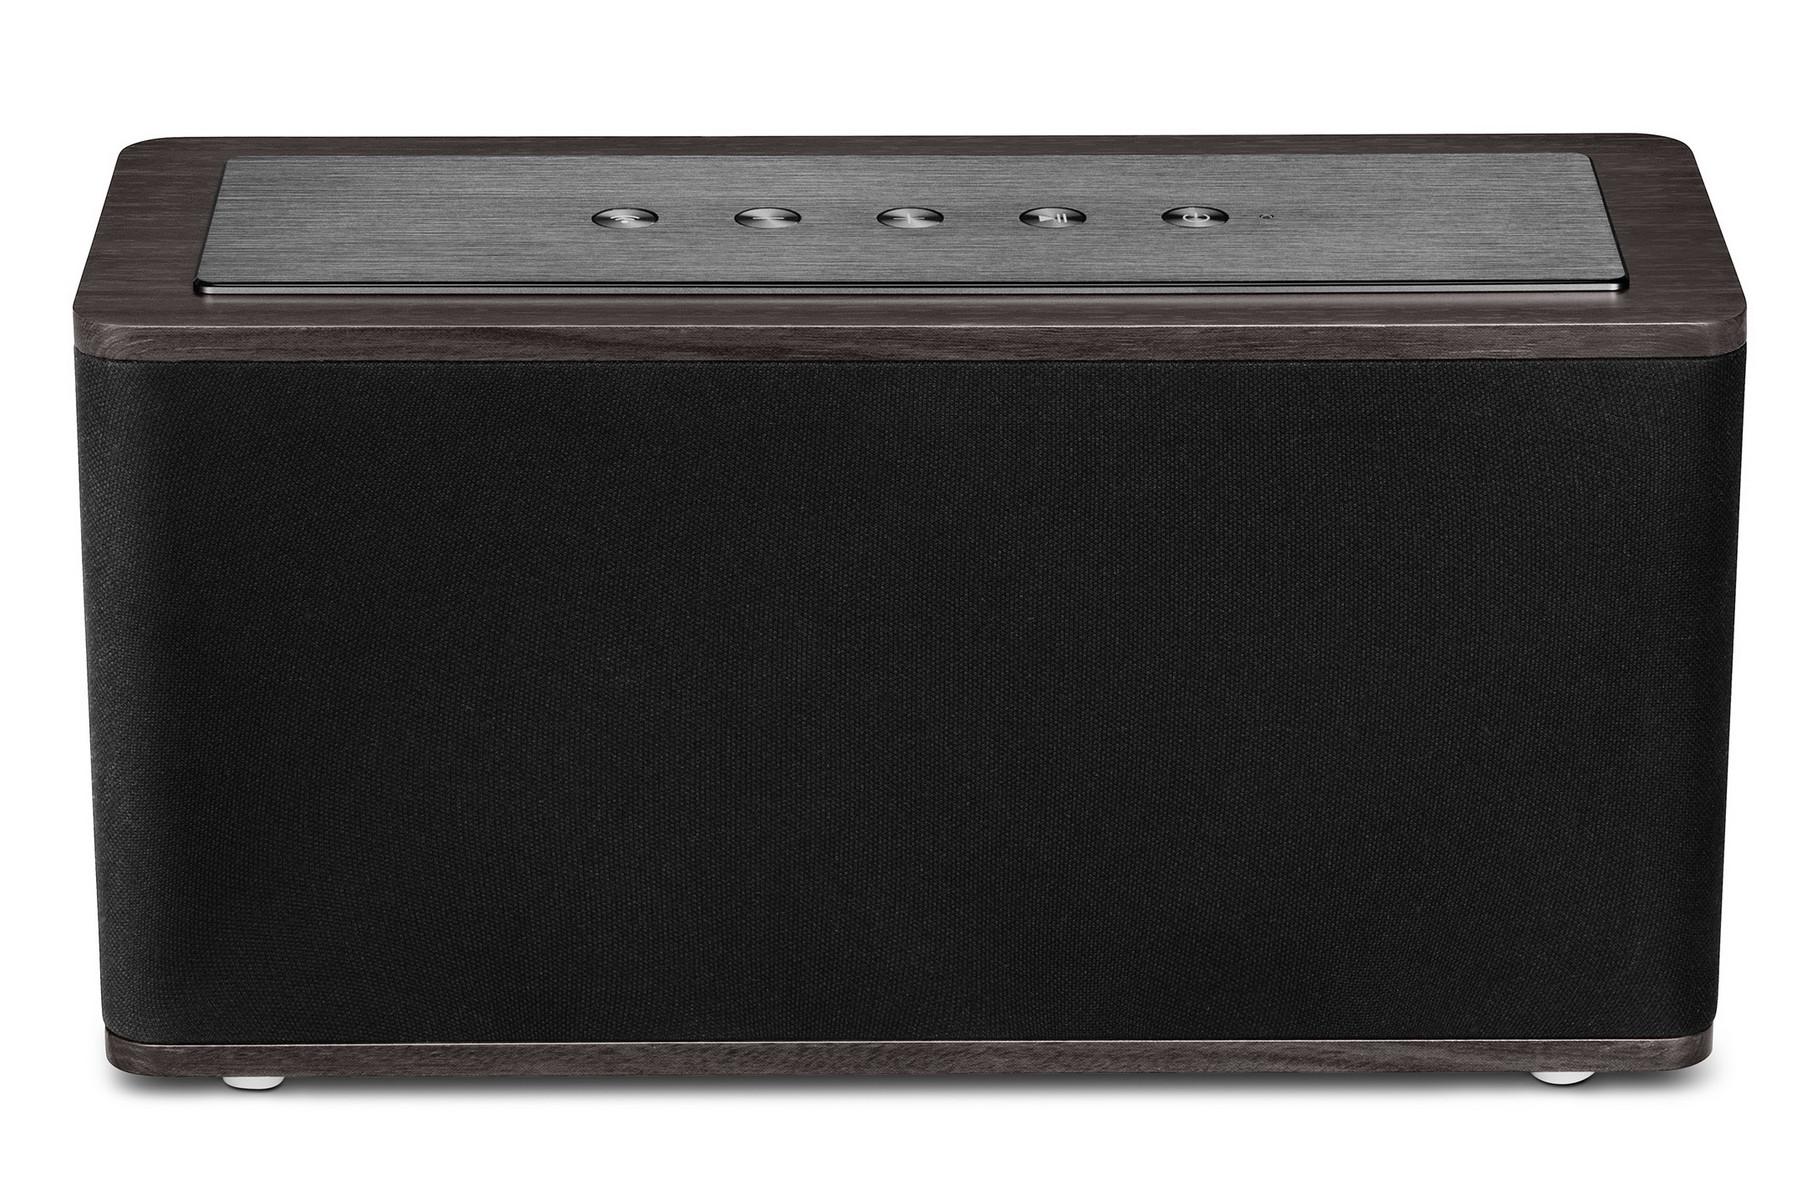 aldi medion p56000 pc x18112 uhd smart tv und wlan speaker x61002 news. Black Bedroom Furniture Sets. Home Design Ideas